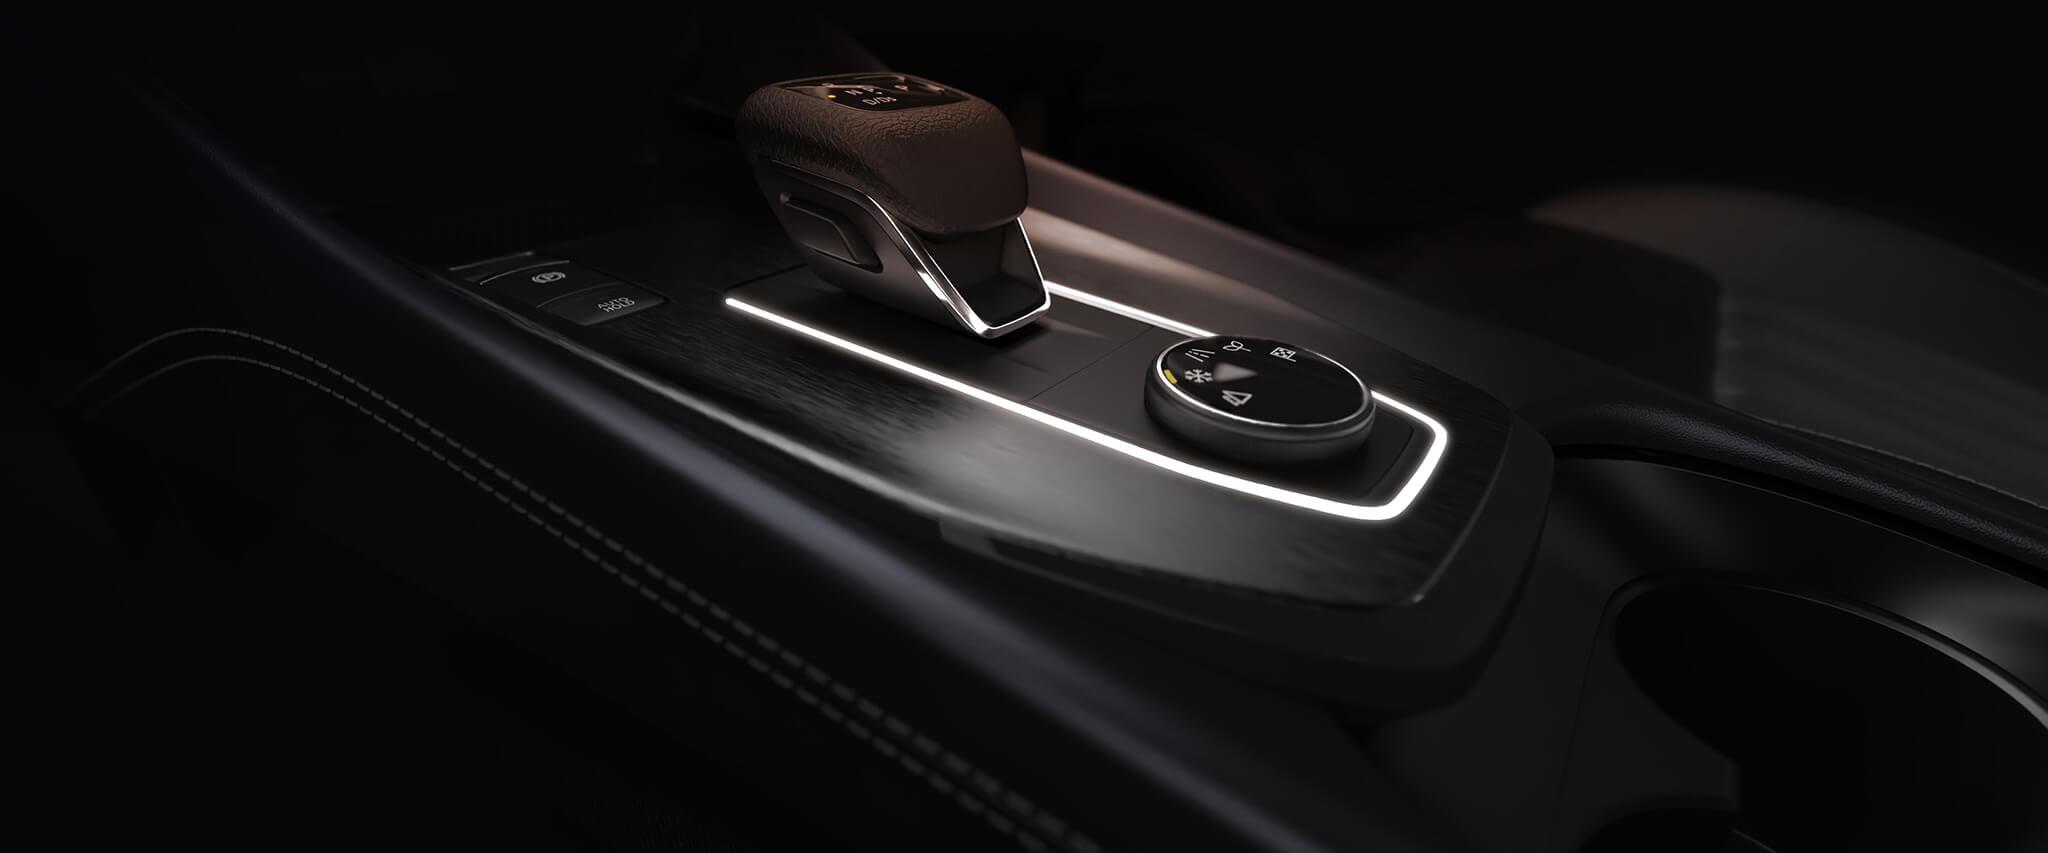 Nissan Qashqai interior 2021